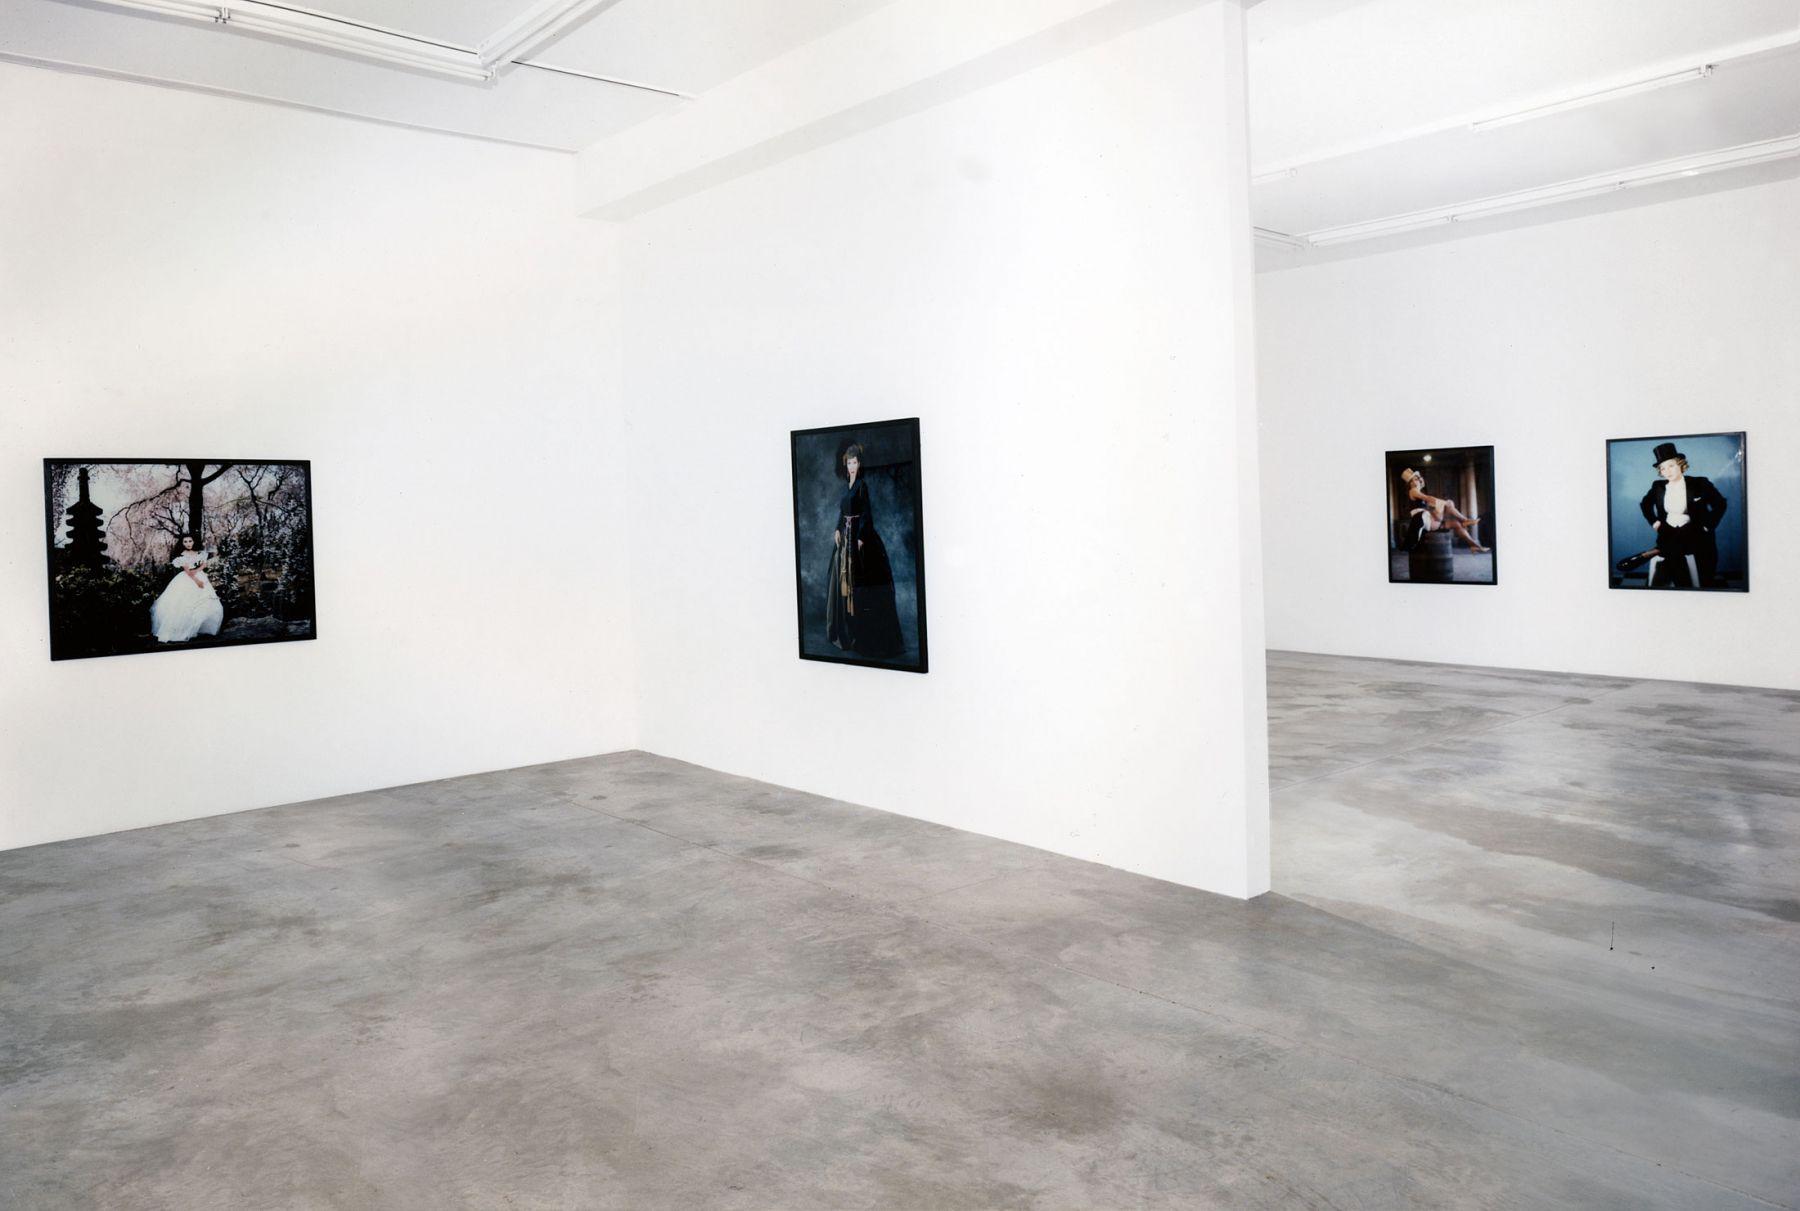 Yasumasa Morimura, Installation view